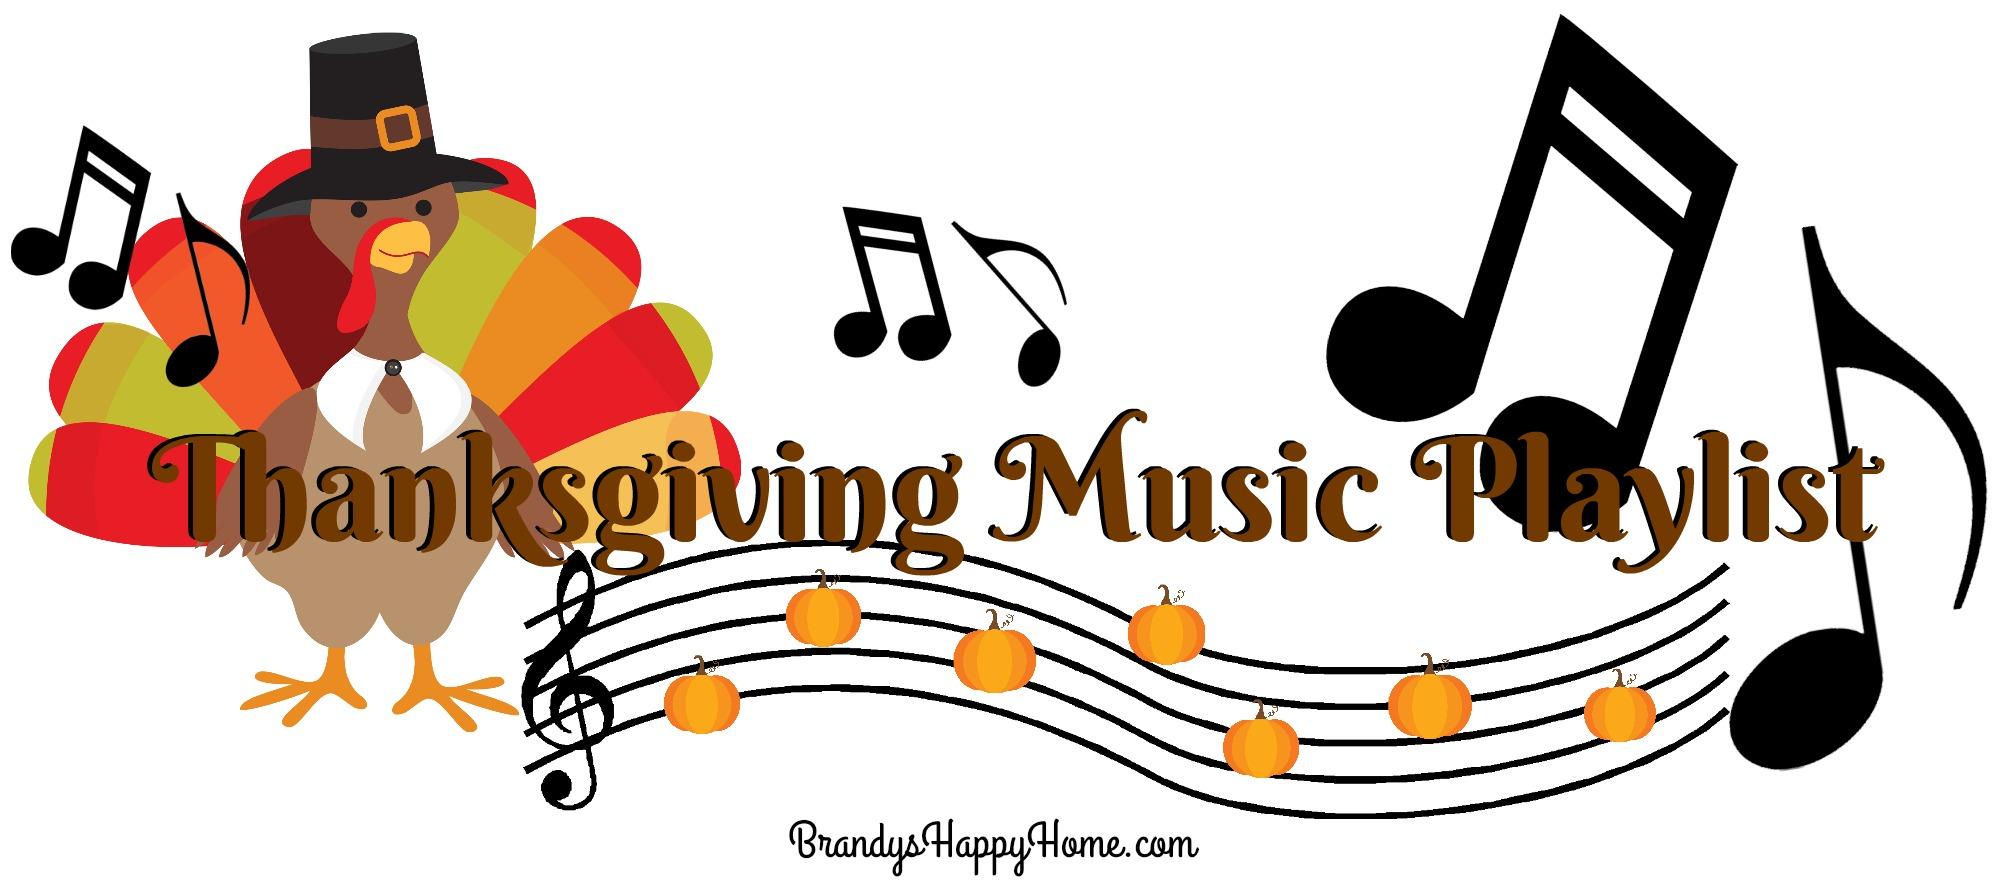 Thanksgiving Music Playlist.